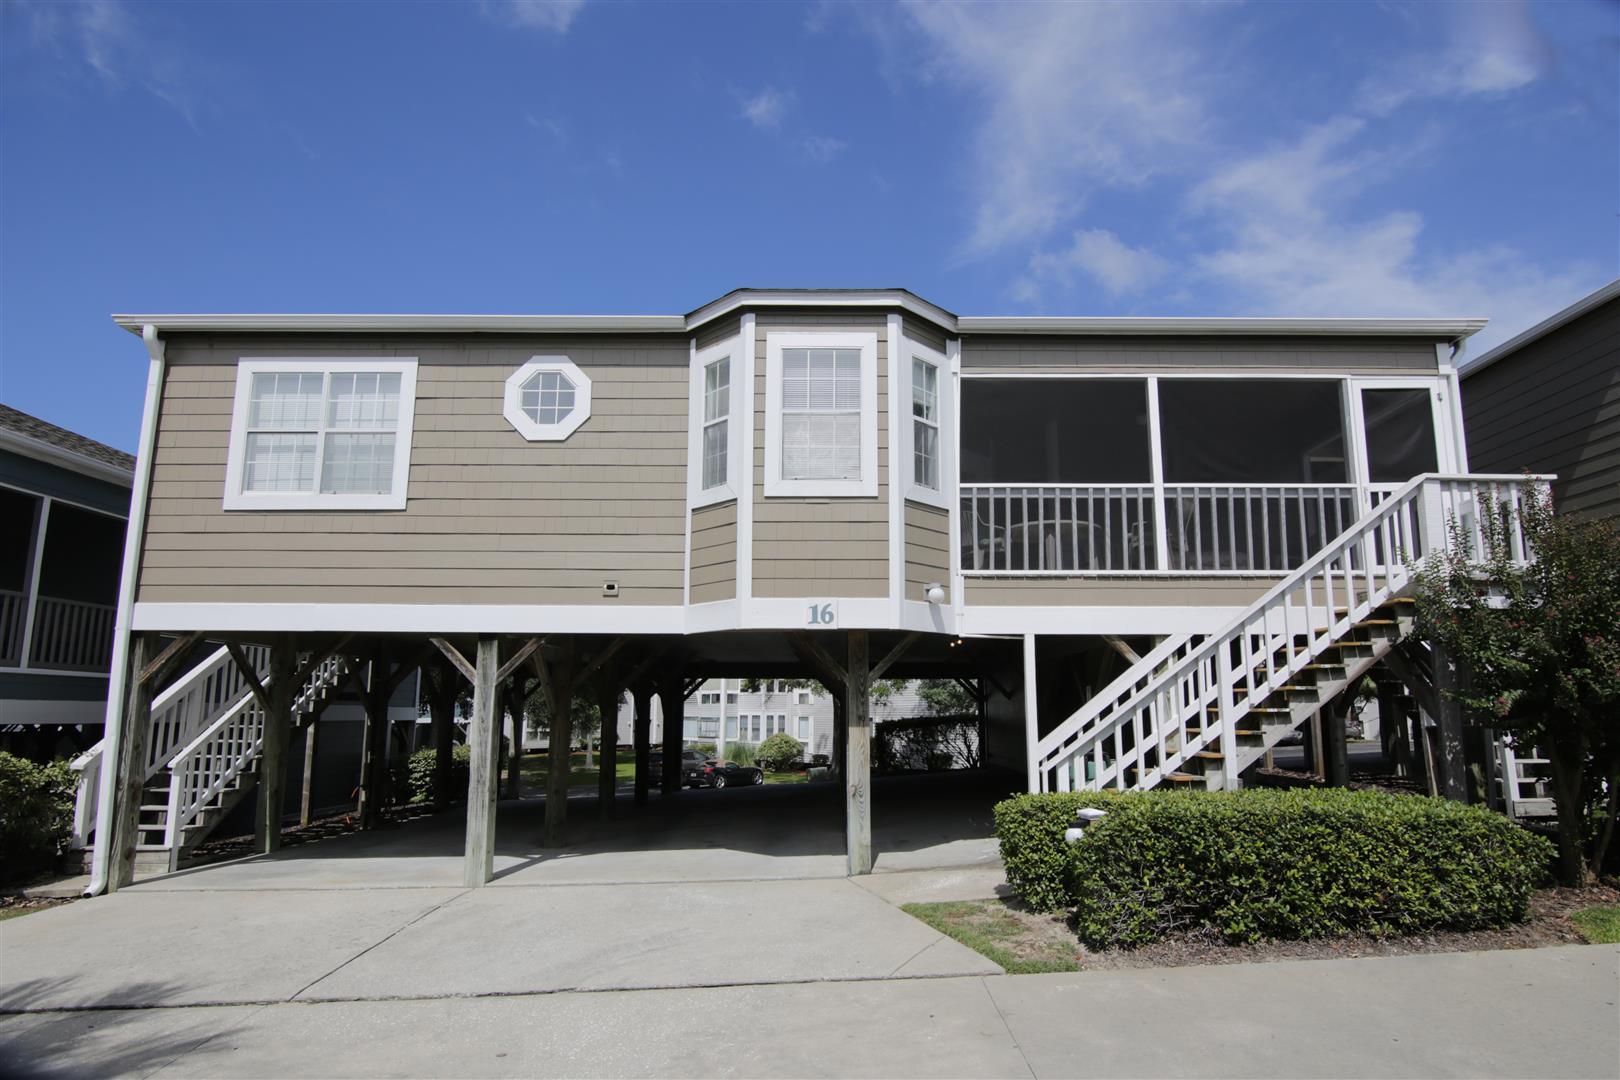 Nice House For Rent Myrtle Beach Sc Part - 2: Myrtle Beach Vacation Rentals